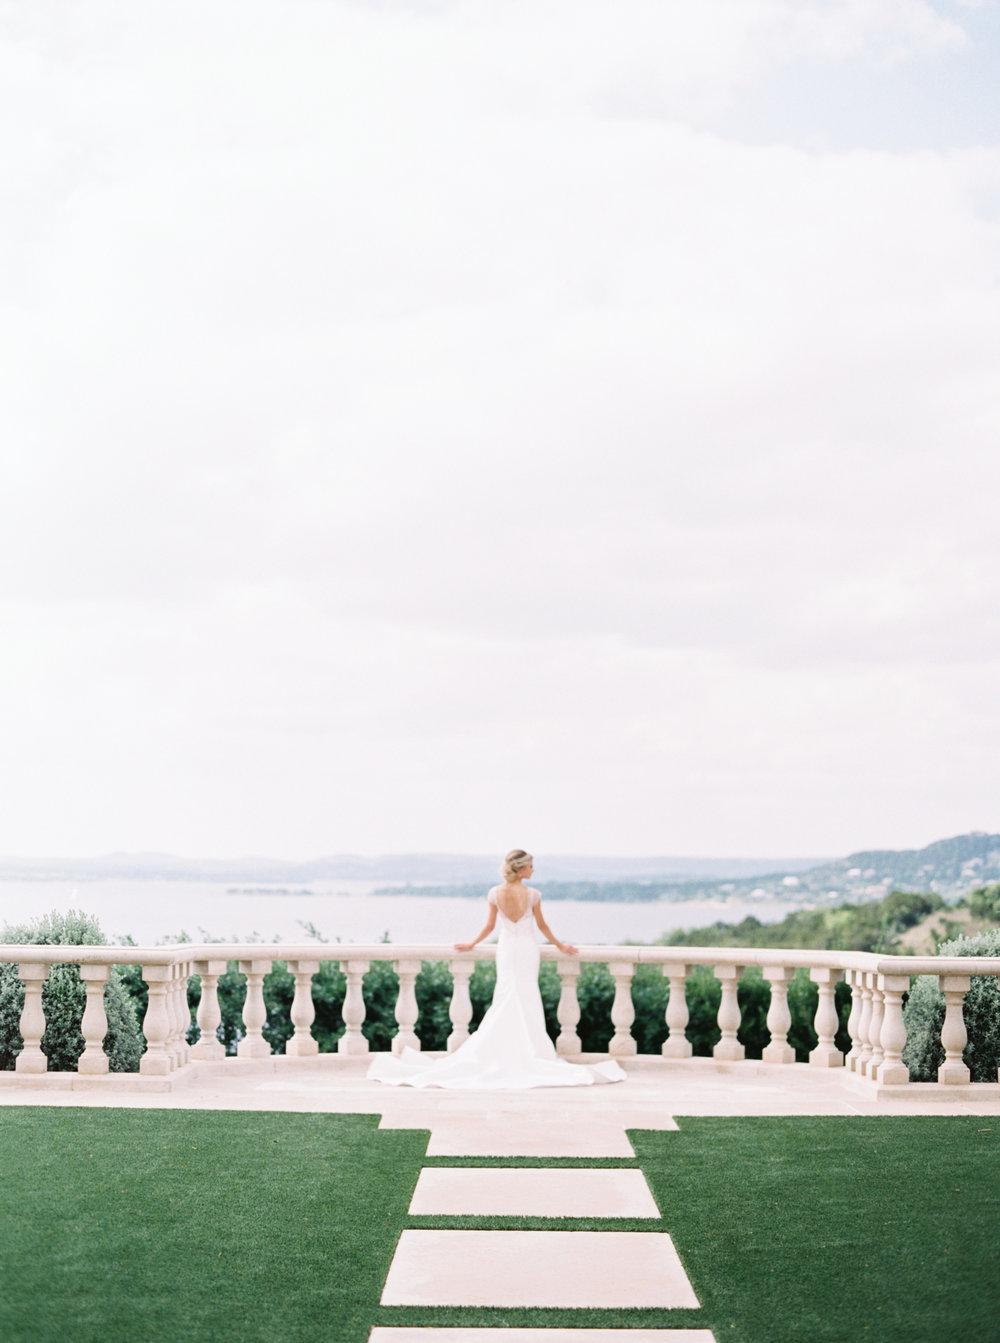 jenna-mcelroy-bridal-portraits-a-southern-tradition-12